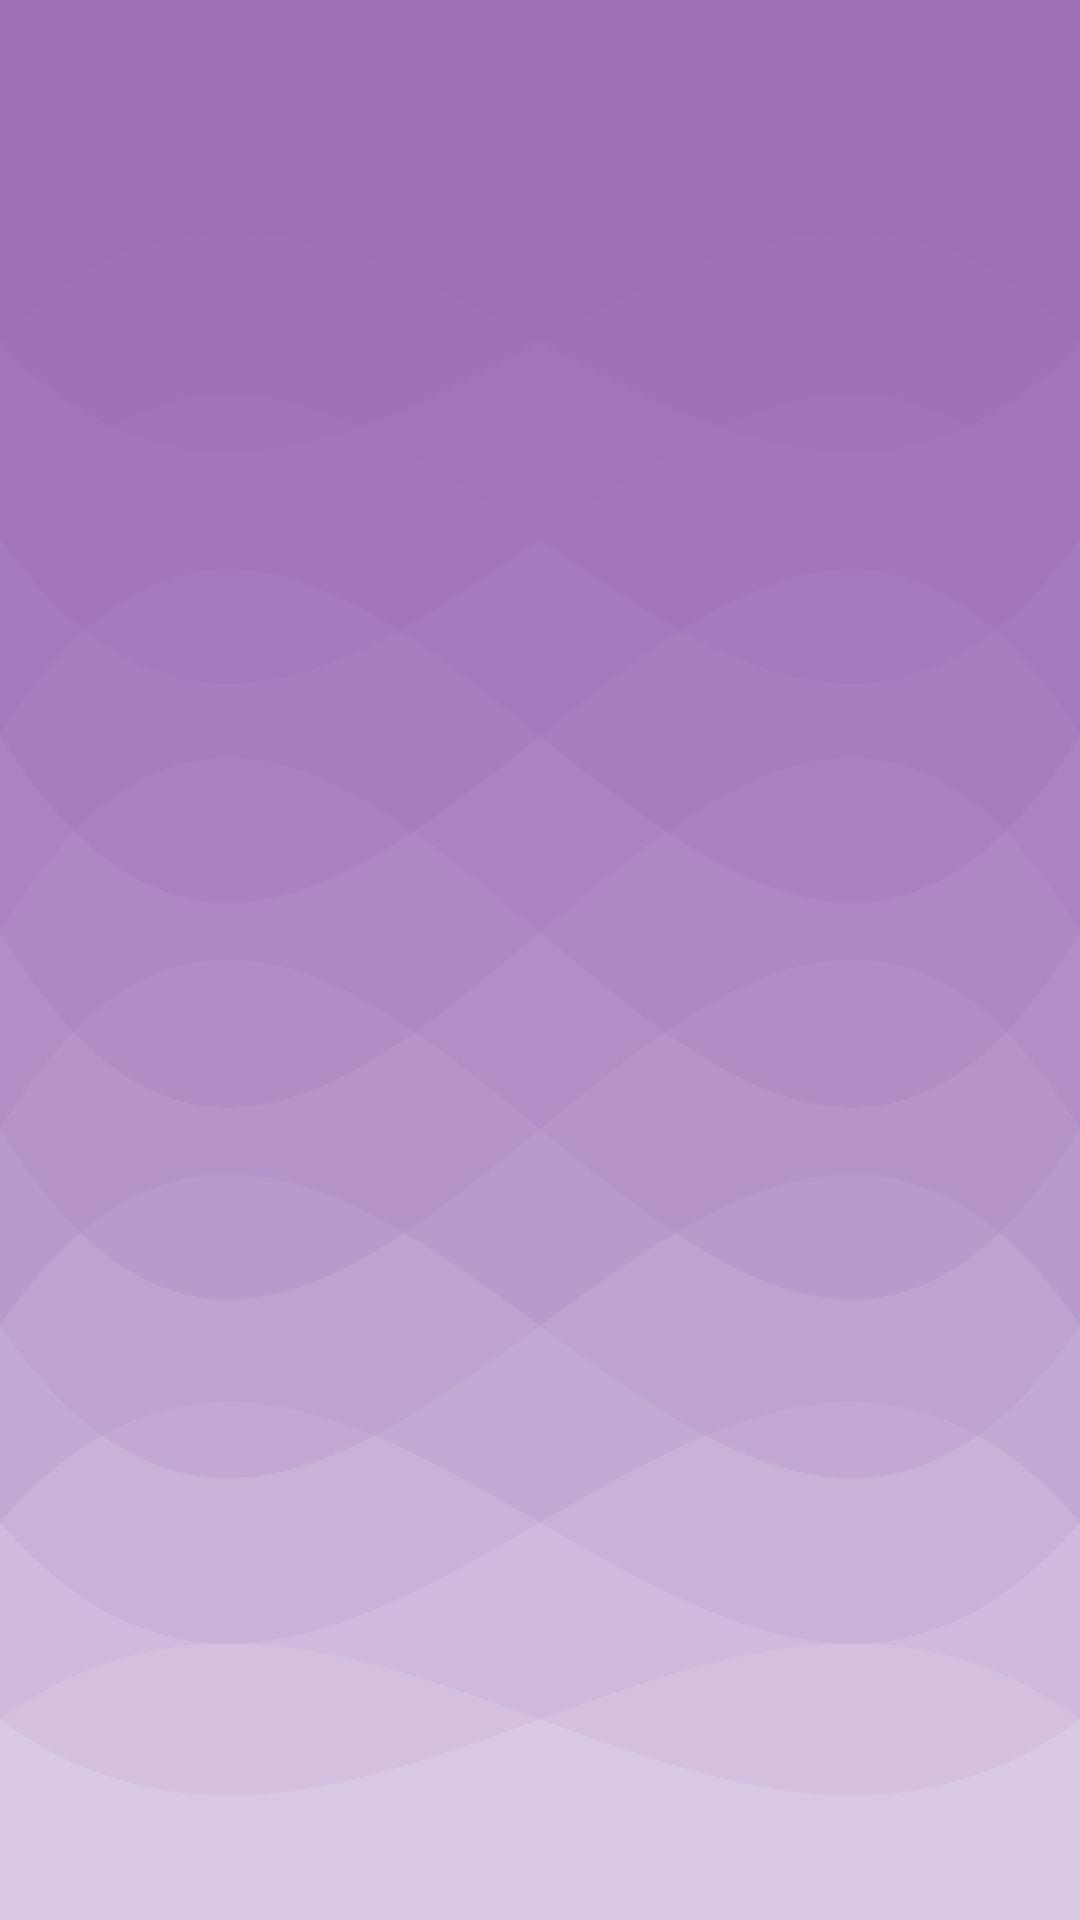 Background Warna Ungu Muda : background, warna, Gradasi, Warna, Putih, D'écran, 1080x1920, WallpaperTip